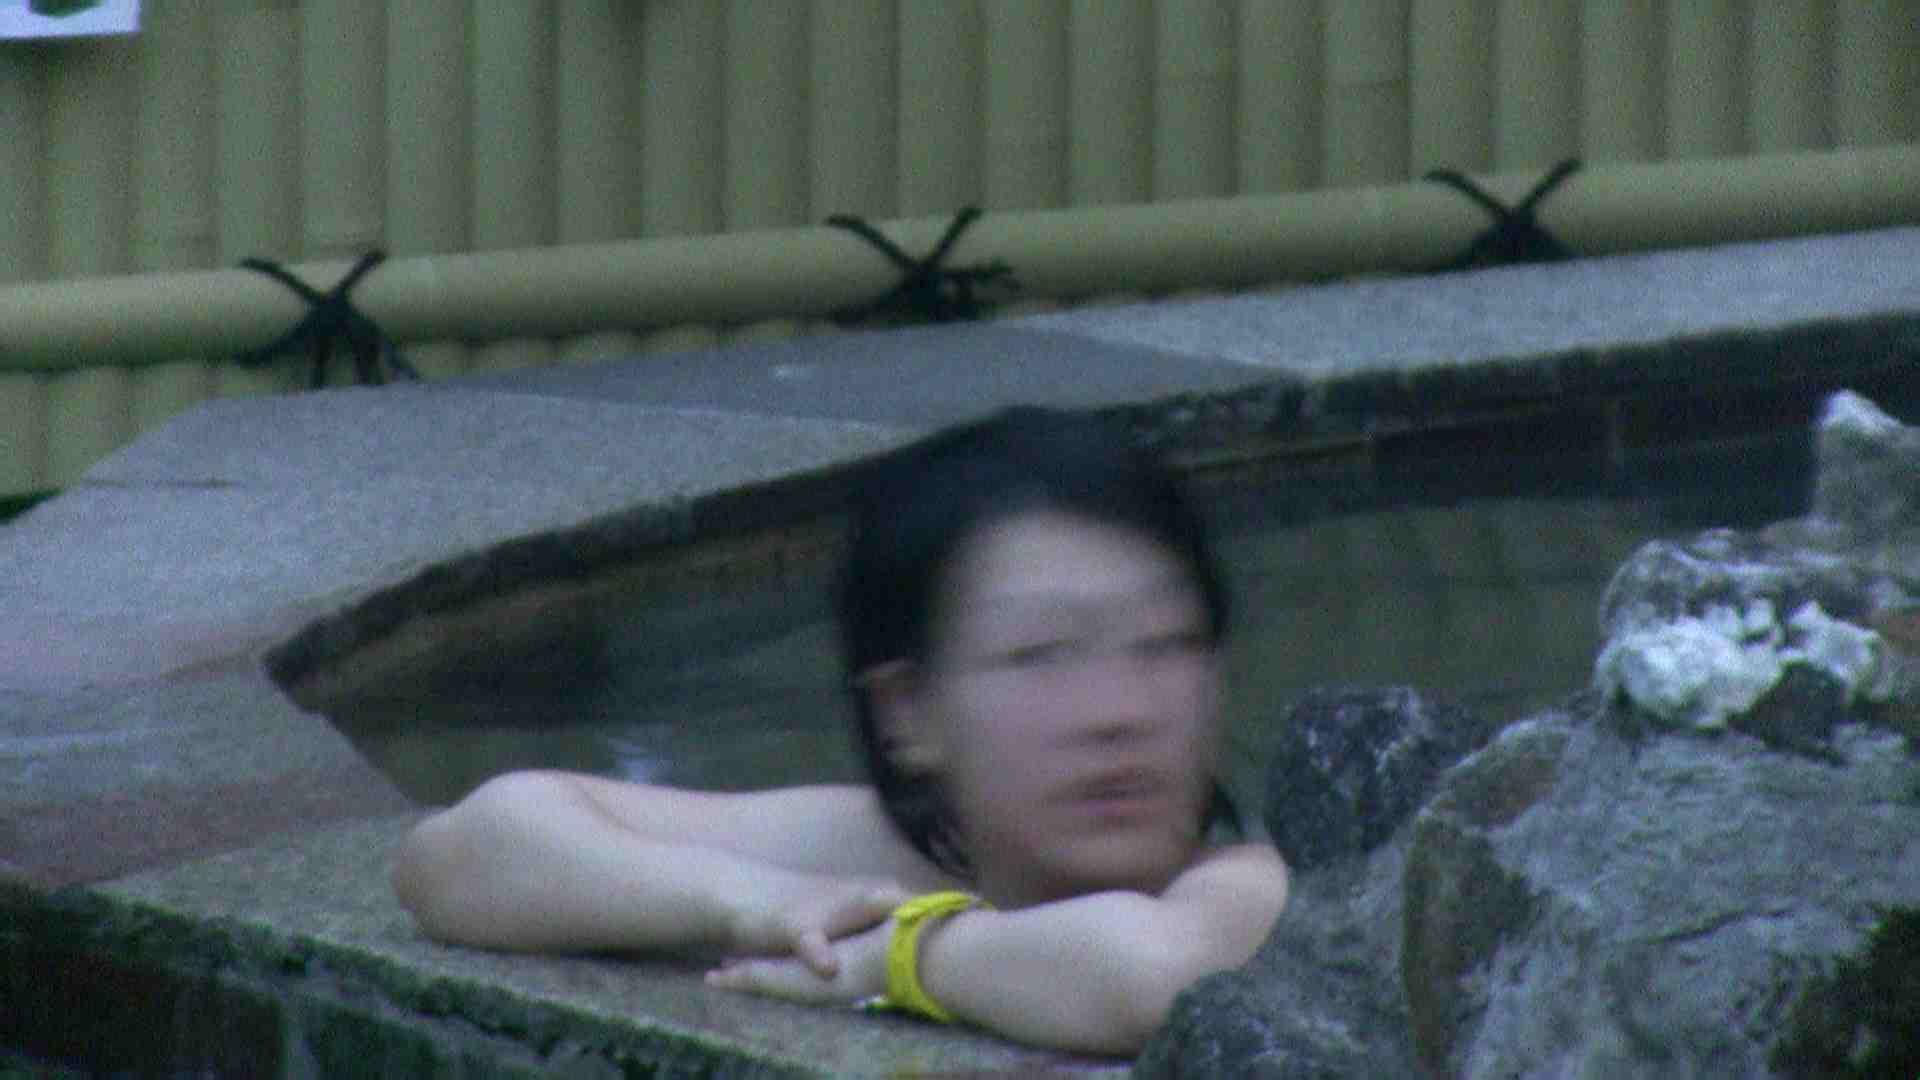 Aquaな露天風呂Vol.05【VIP】 露天風呂編  112PIX 92